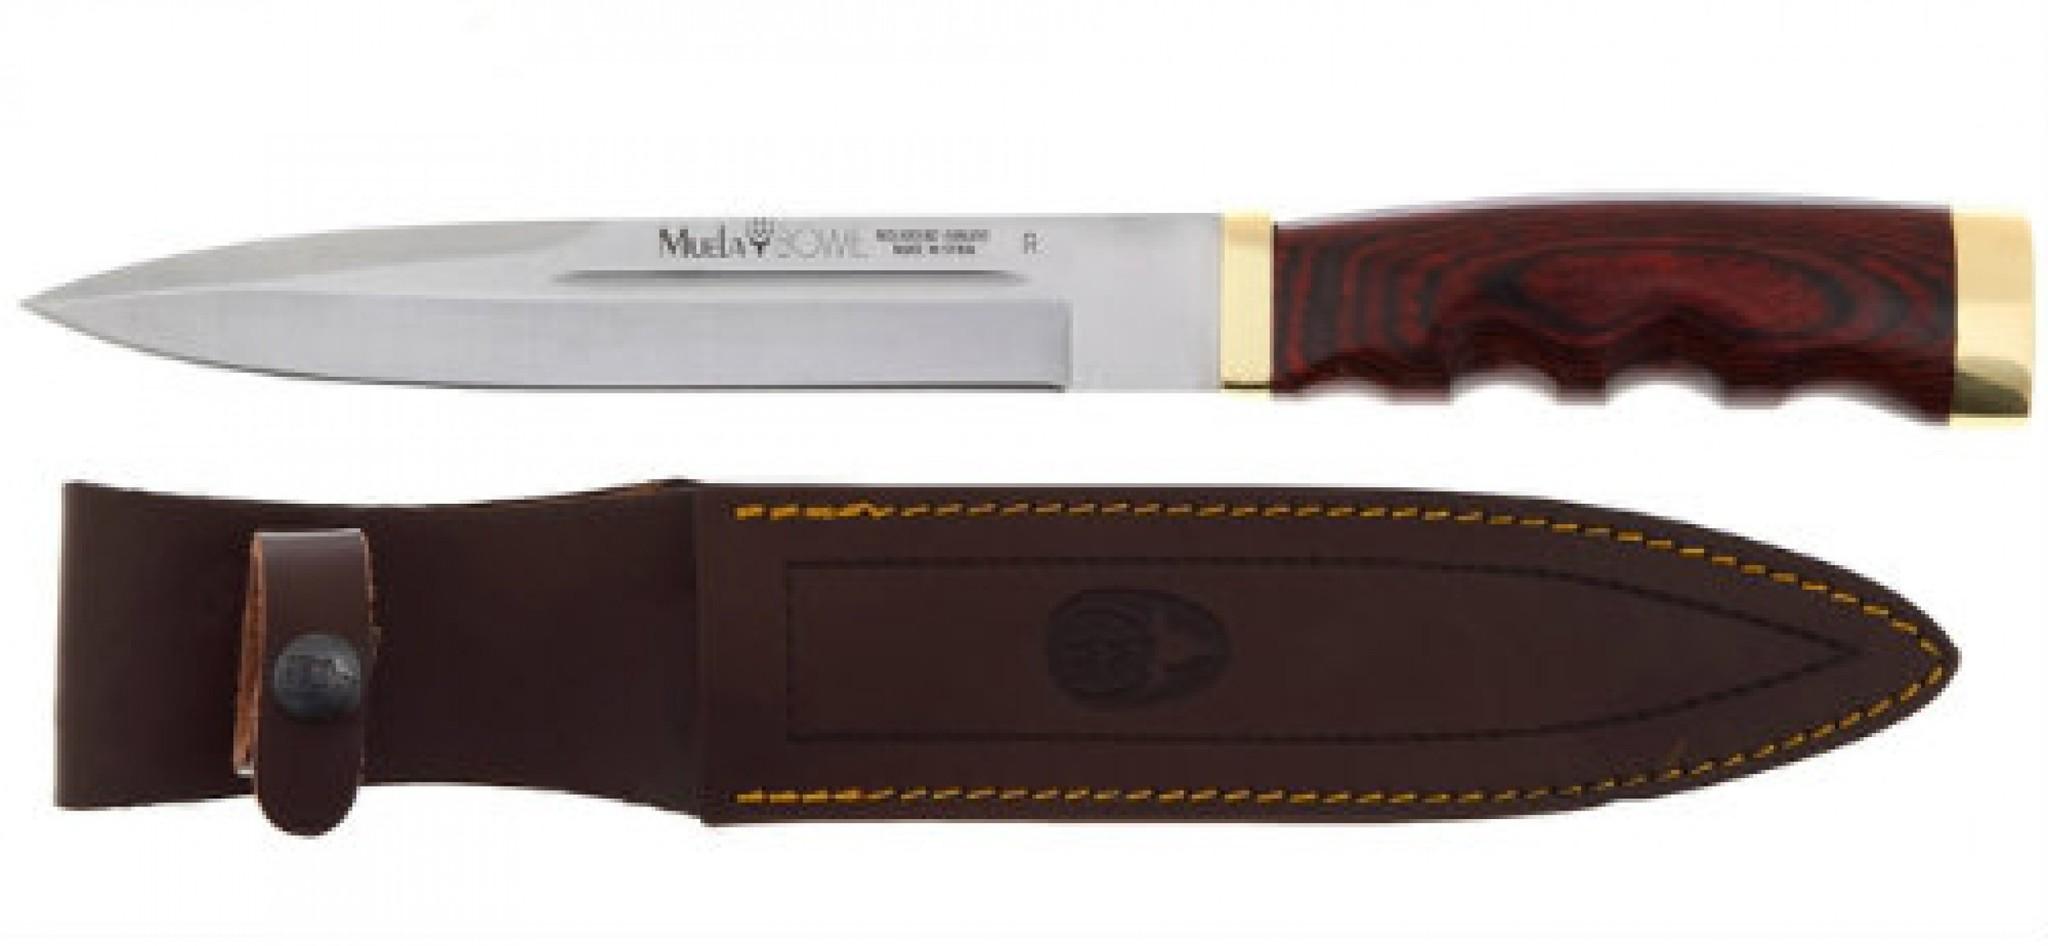 Нож с фиксированным клинком Bowie, Pakka Wood Handles 18.0 см. U/BW-18RОхотнику<br>Нож с фиксированным клинком Bowie, Pakka Wood Handles 18.0 см. U/BW-18R<br>